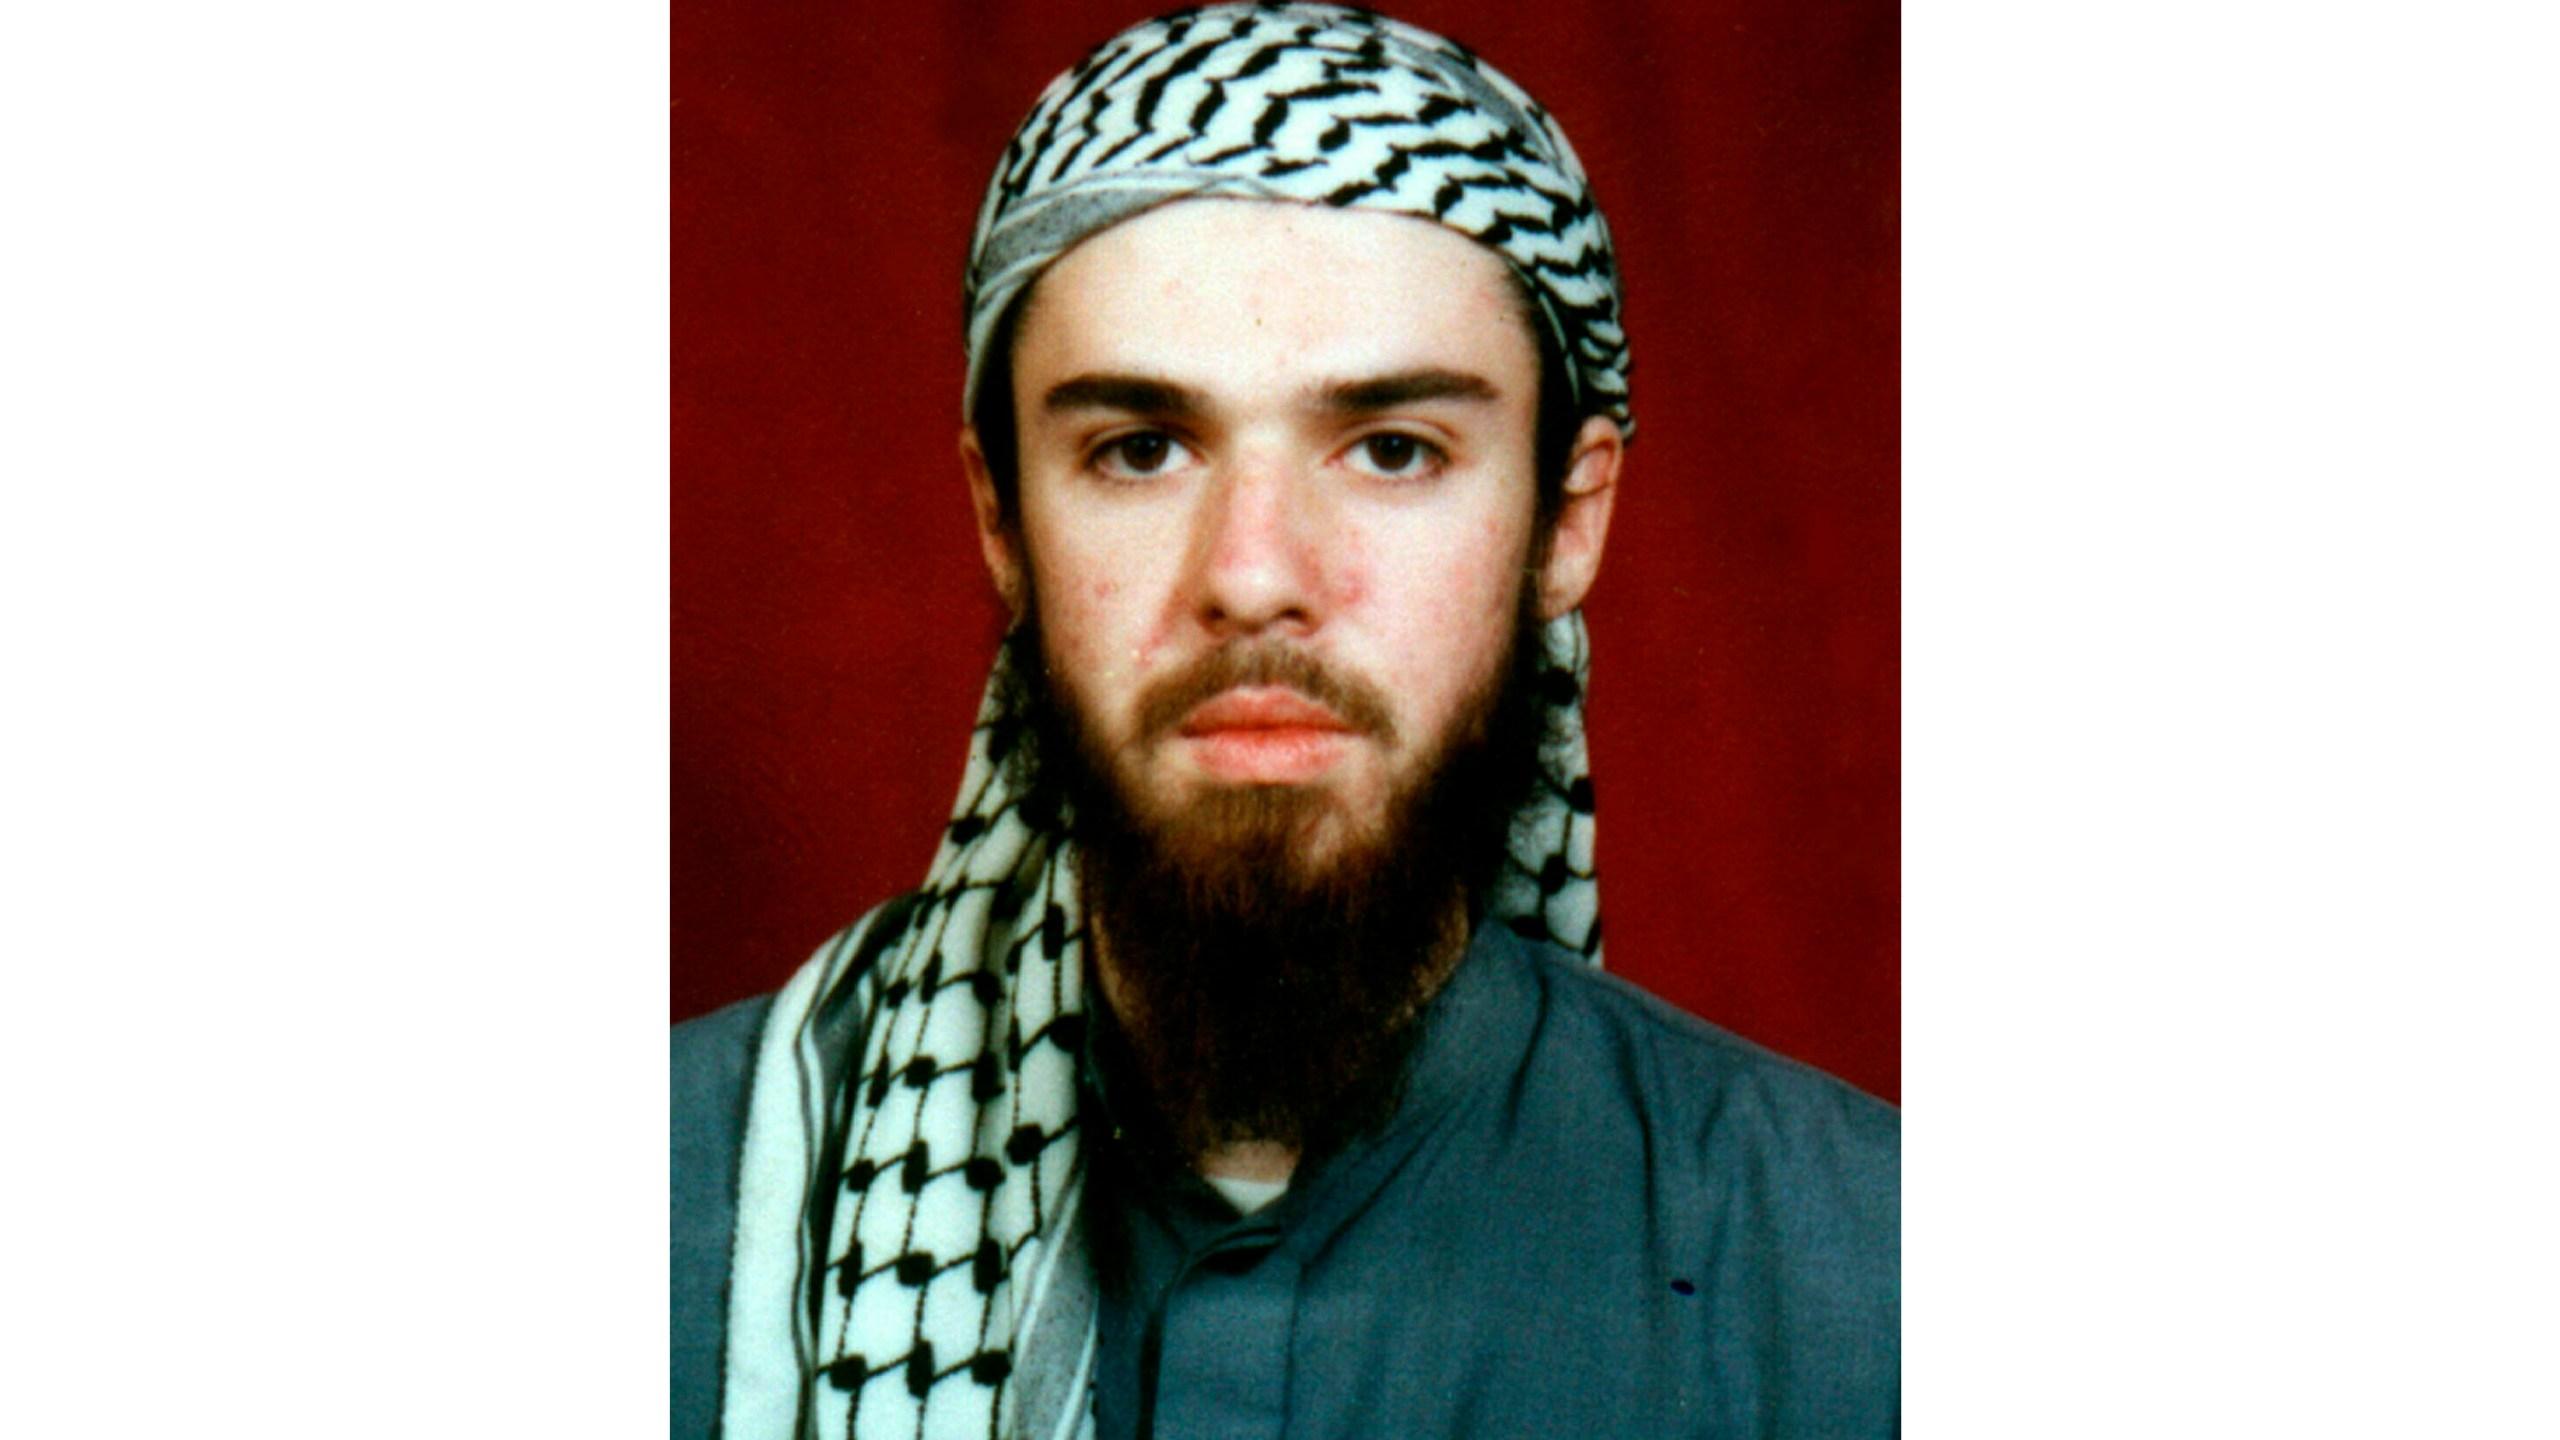 American_Taliban_Release_26408-159532.jpg87704413